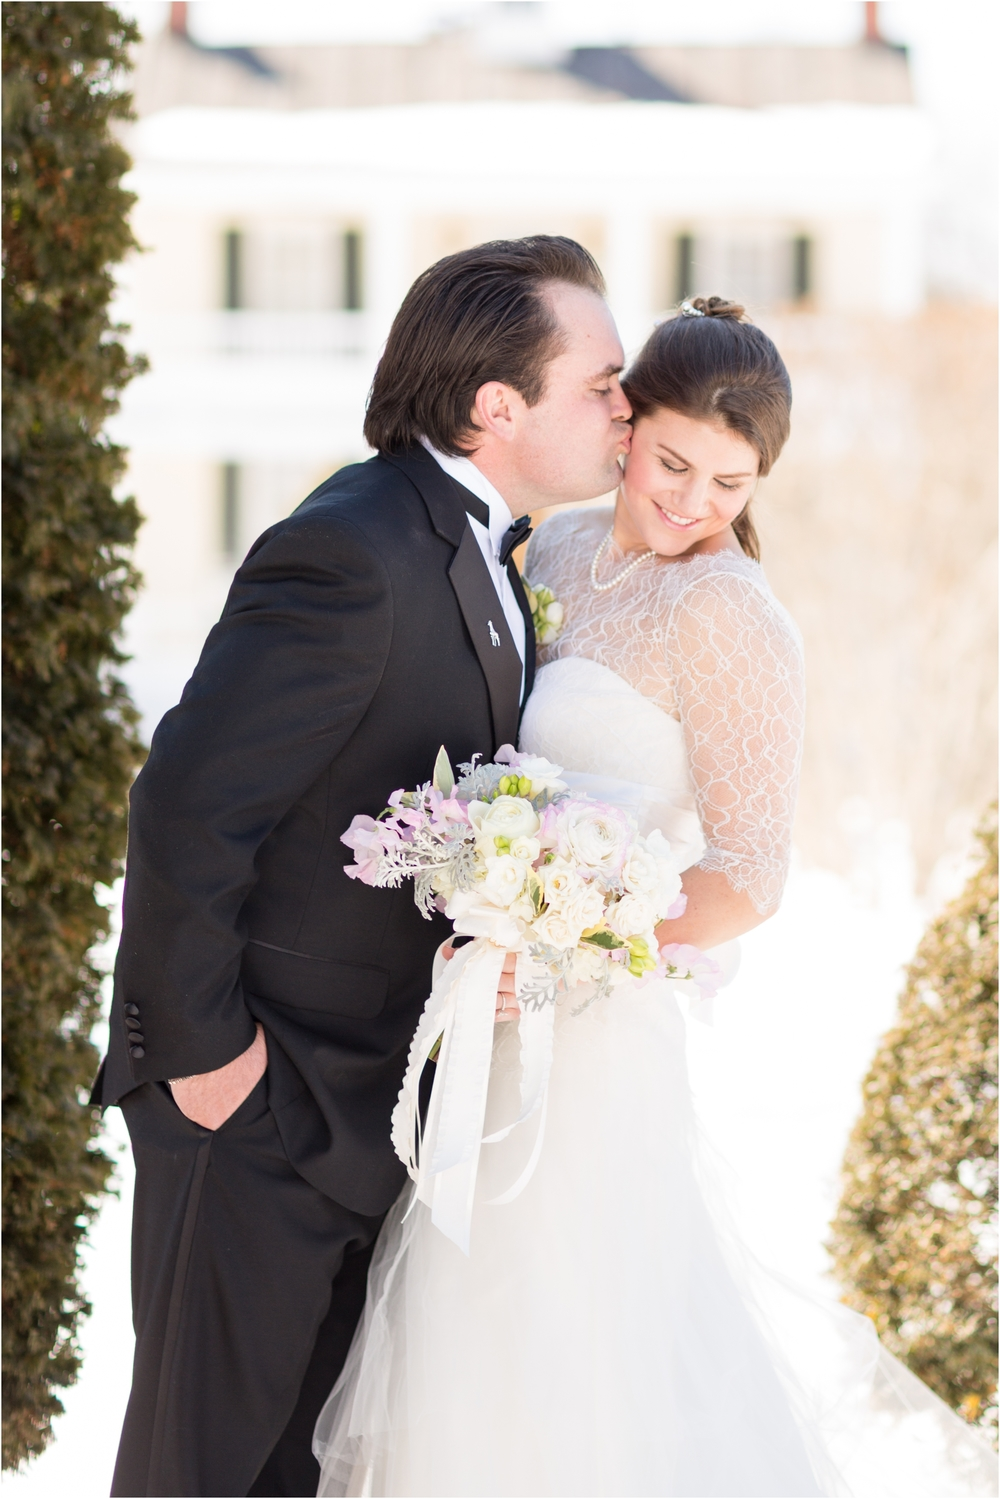 2-Dunn-Wedding-Bride-Groom-Portraits-878.jpg